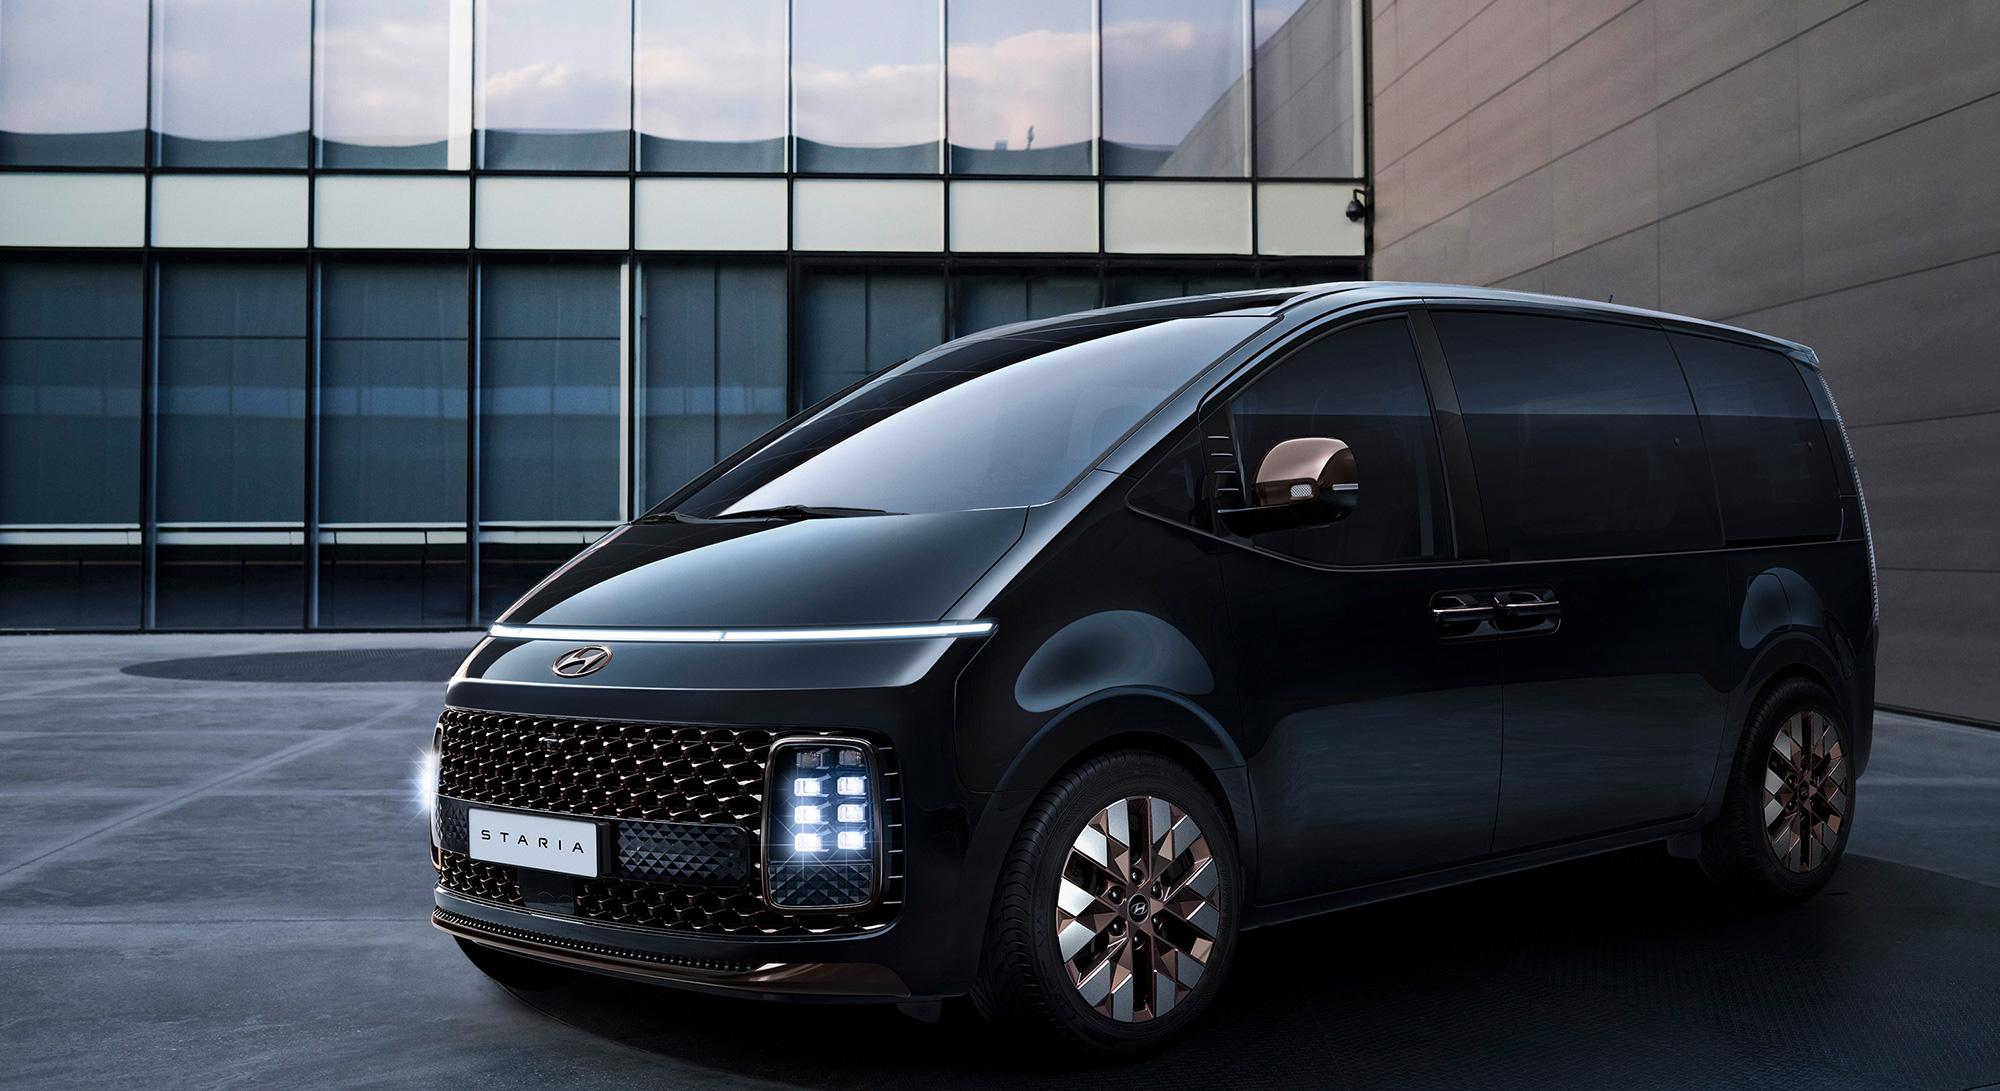 Hyundai Staria, un monospace premium très futuriste